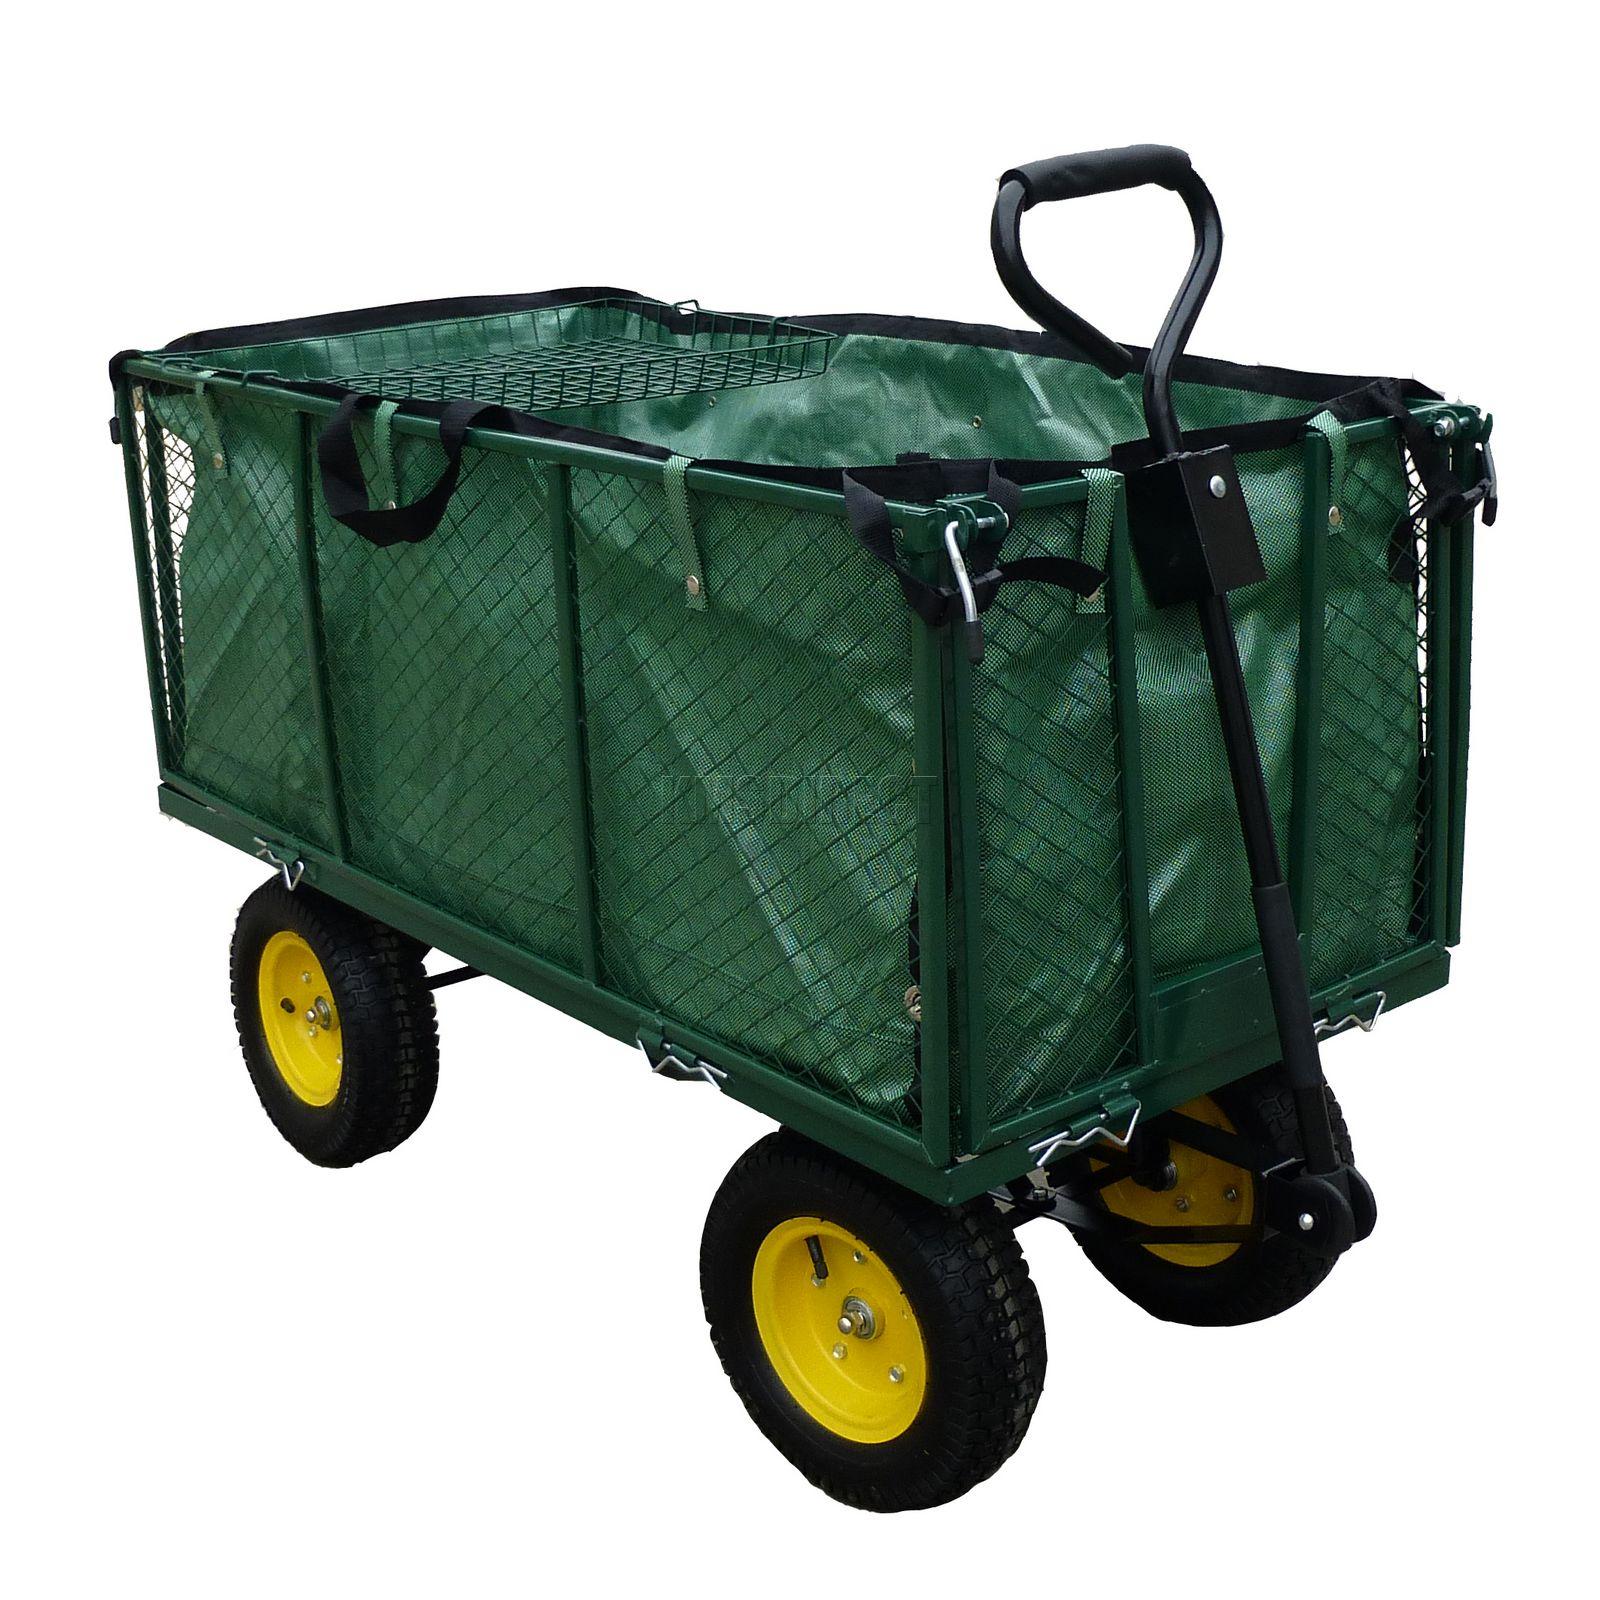 4 Wheel Garden Trolley Cart Truck Wheelbarrow Tipper